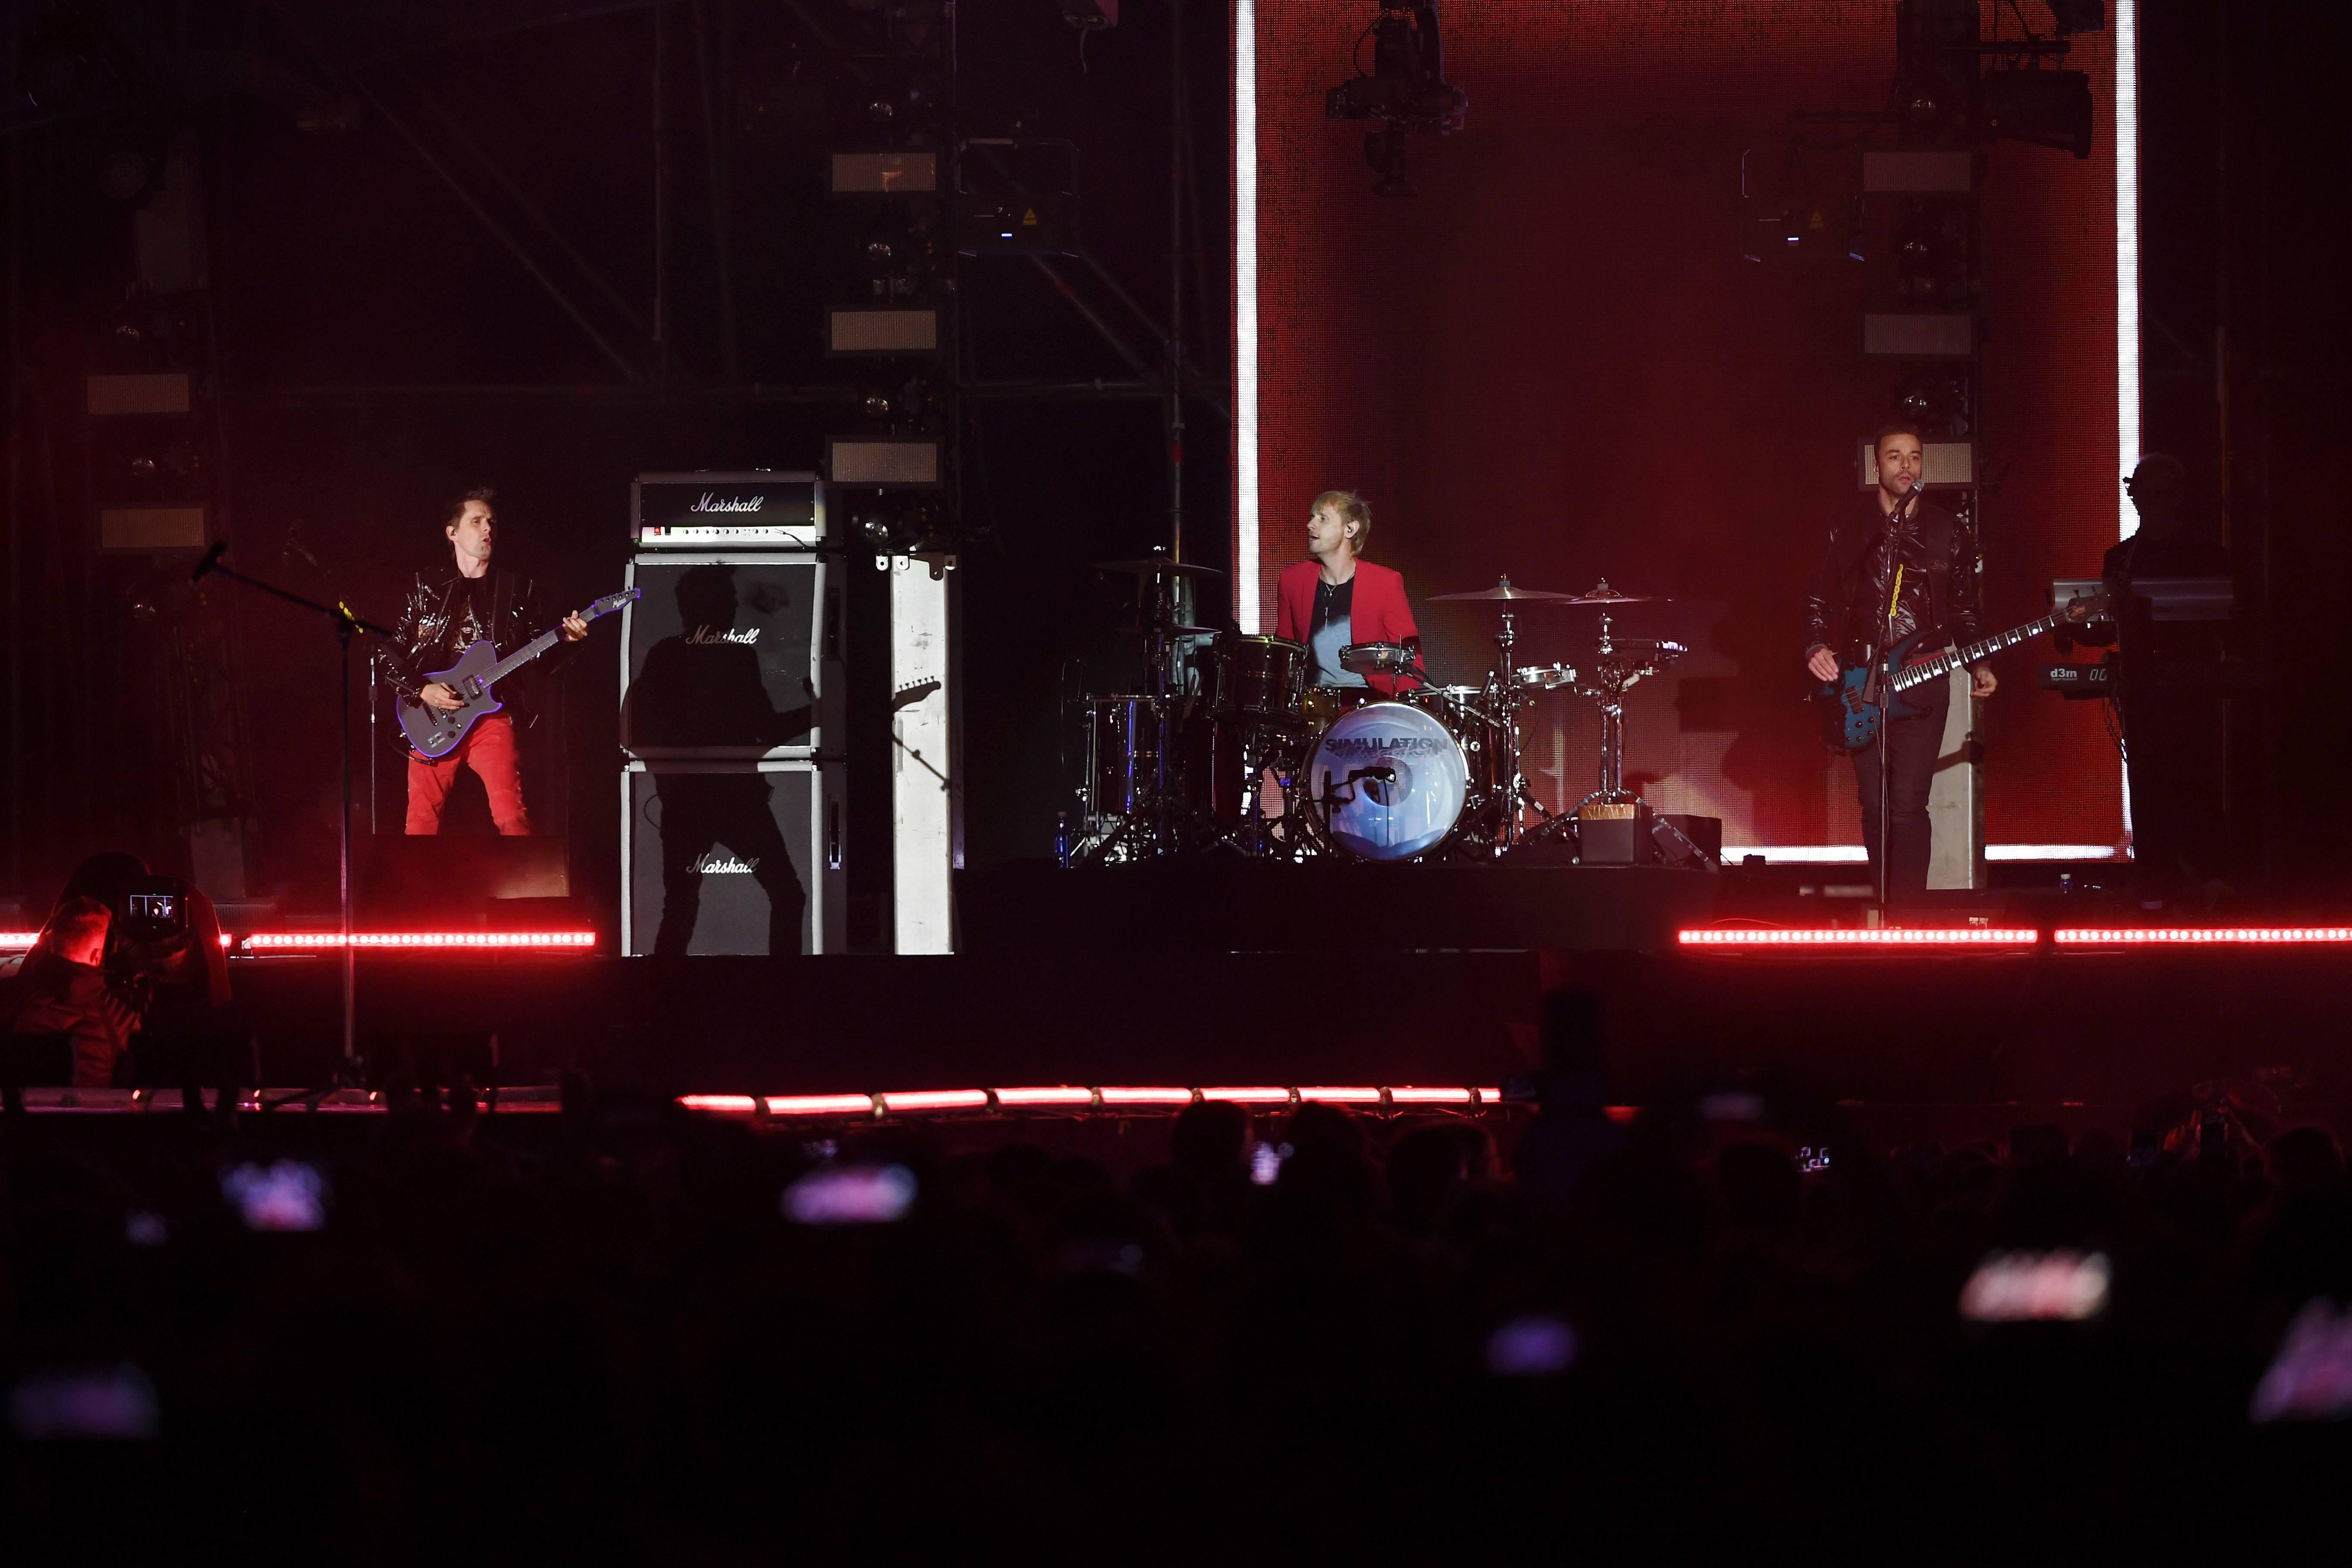 mgid:file:gsp:scenic:/international/mtv.es/images/Muse_-_MTV_World_Stage_-_MTV_EMAs_Bilbao_2018_-_18.JPG